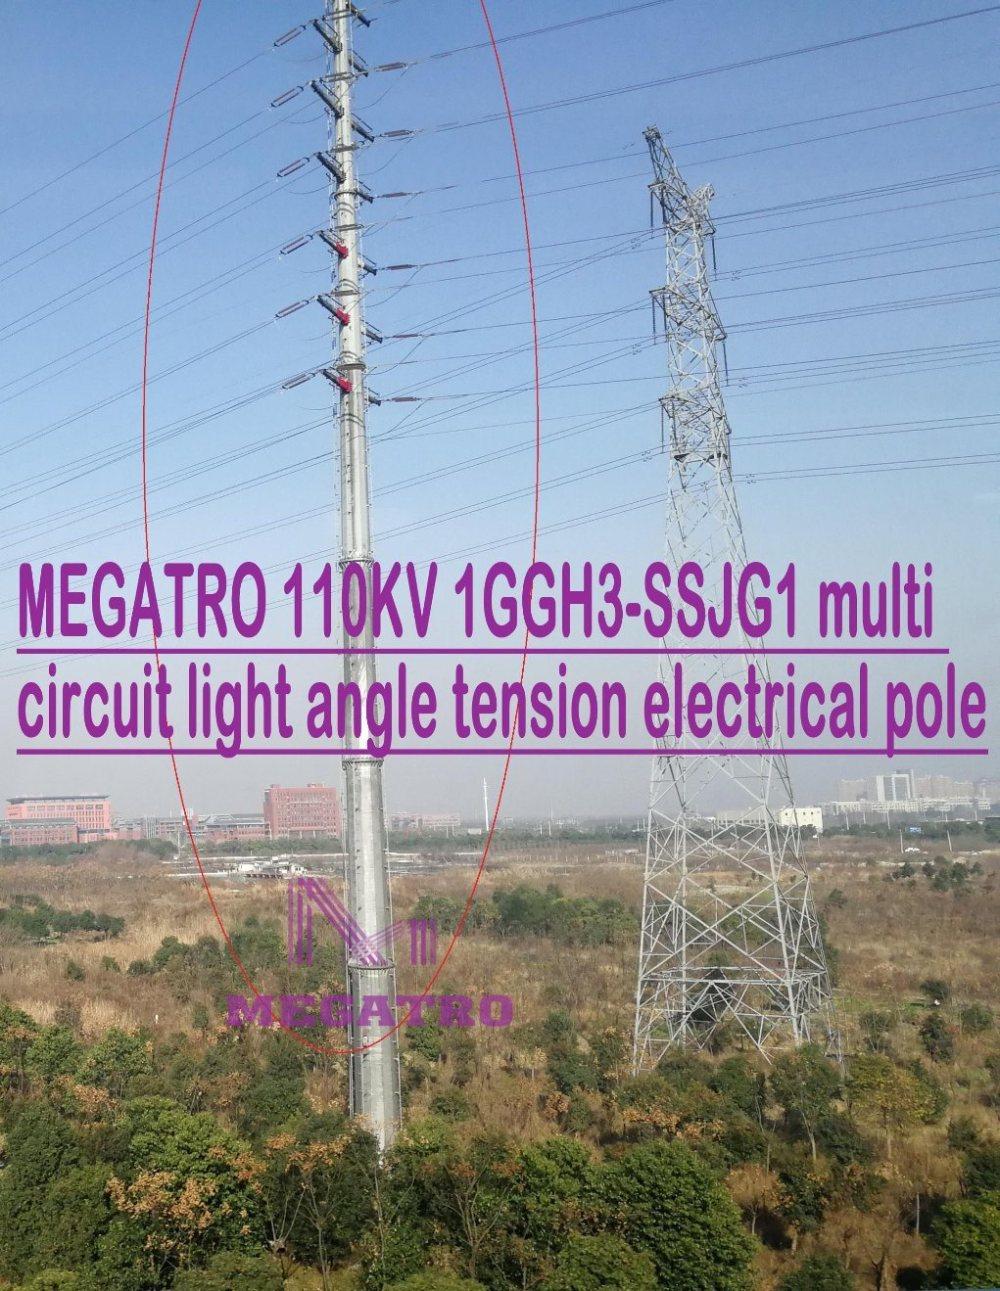 medium resolution of china megatro 110kv 1ggh3 ssjg1 multi circuit light angle tension electrical pole china 110kkv transmission tangent tower 110kv overhead line steel tower